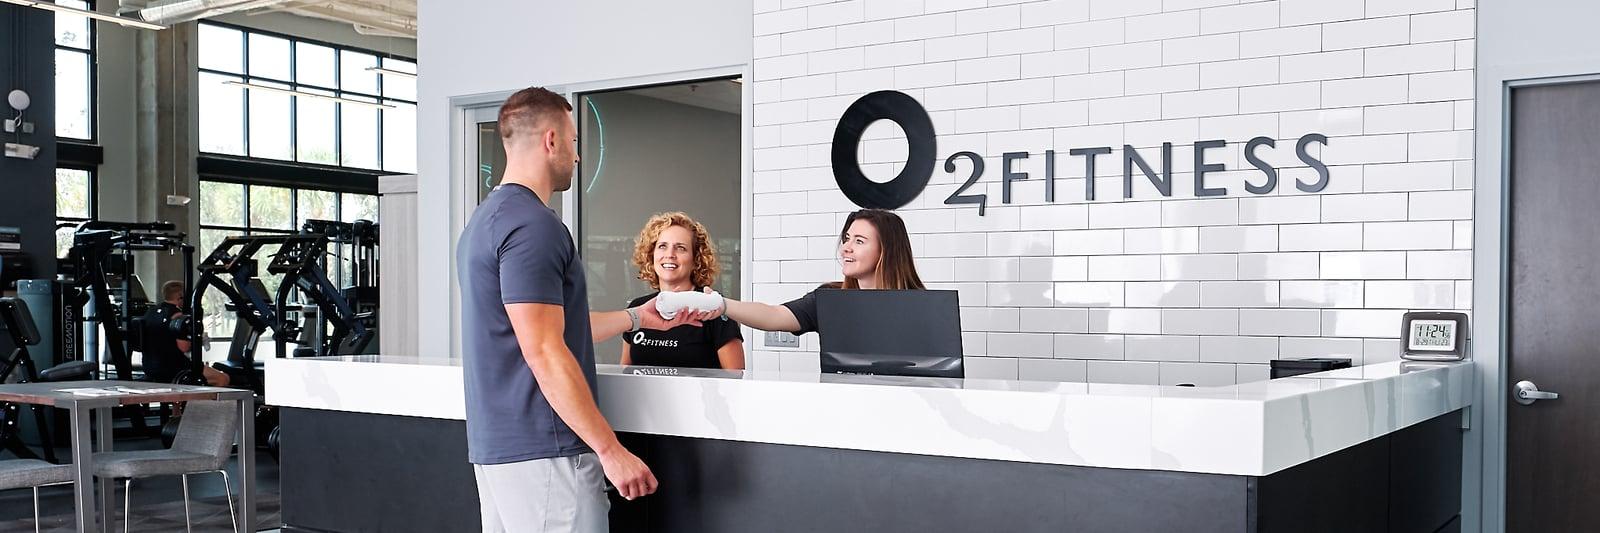 O2 Fitness Club